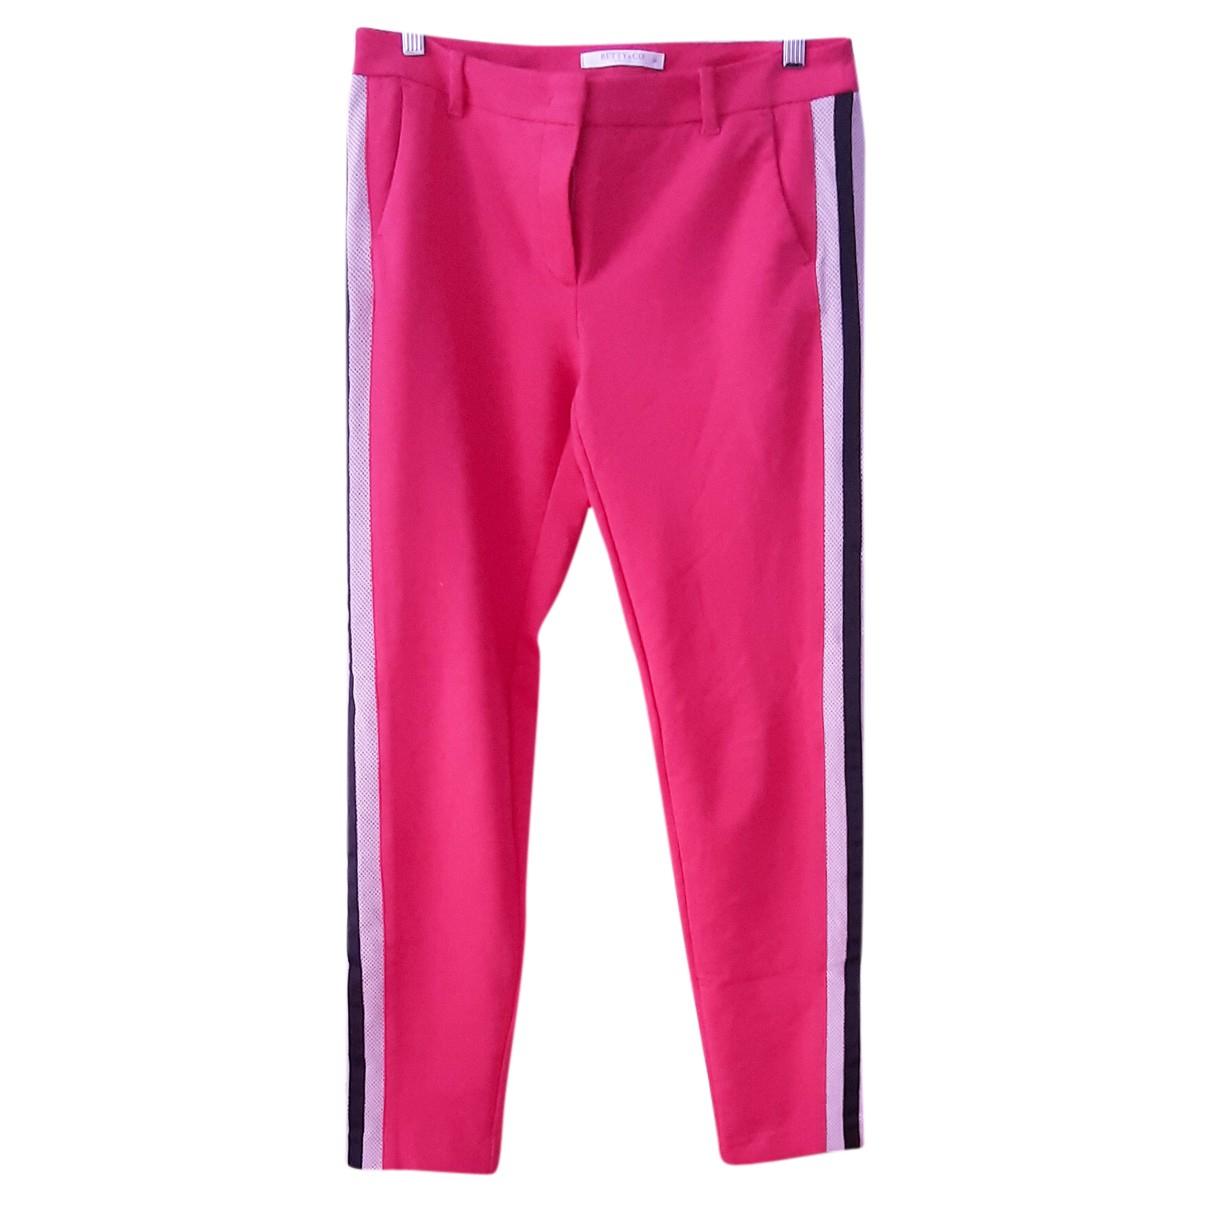 Autre Marque N Pink Cotton Trousers for Women M International